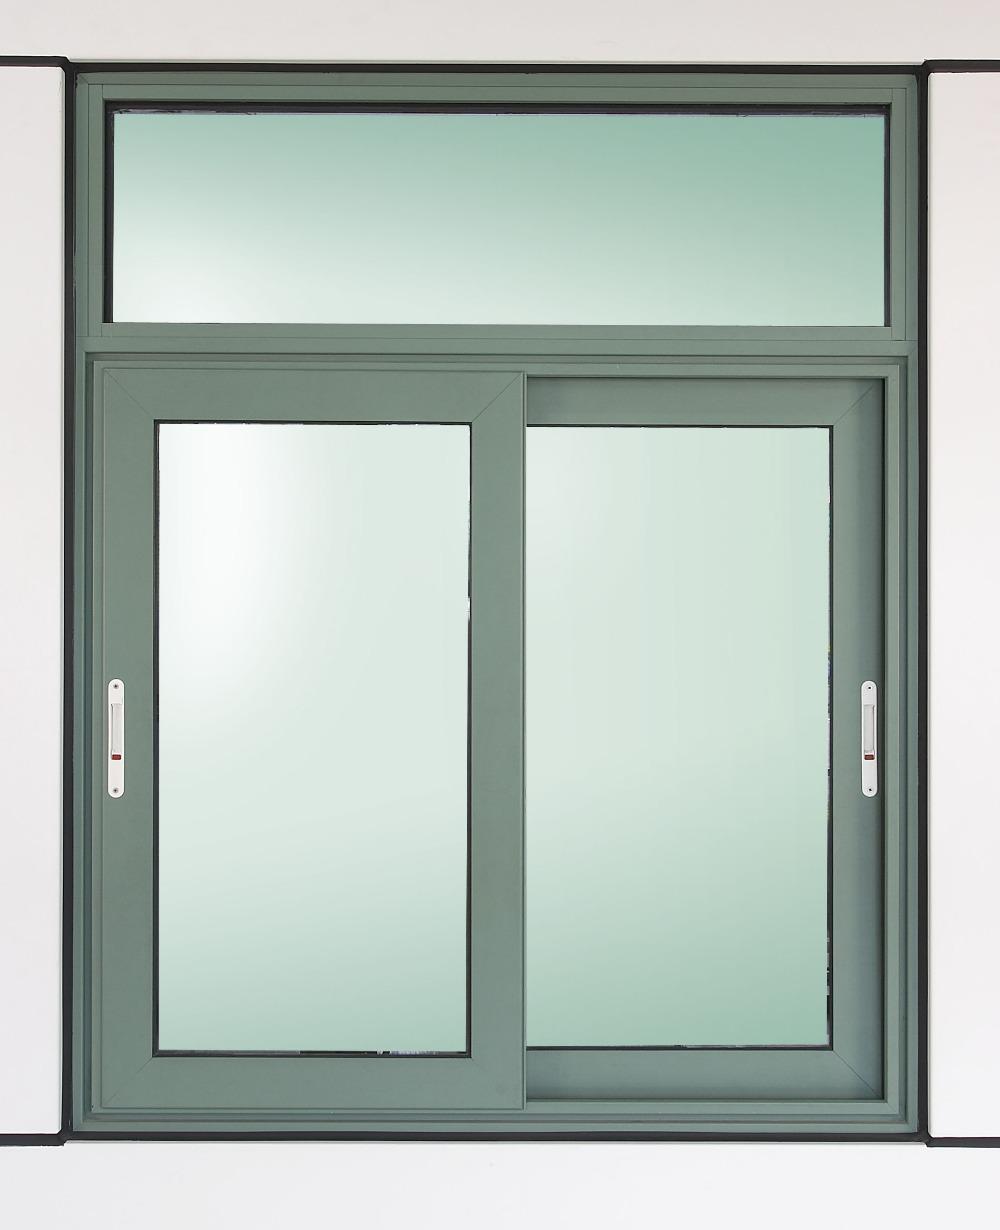 new 2016 aluminum garden windows lowes sliding window buy lowes